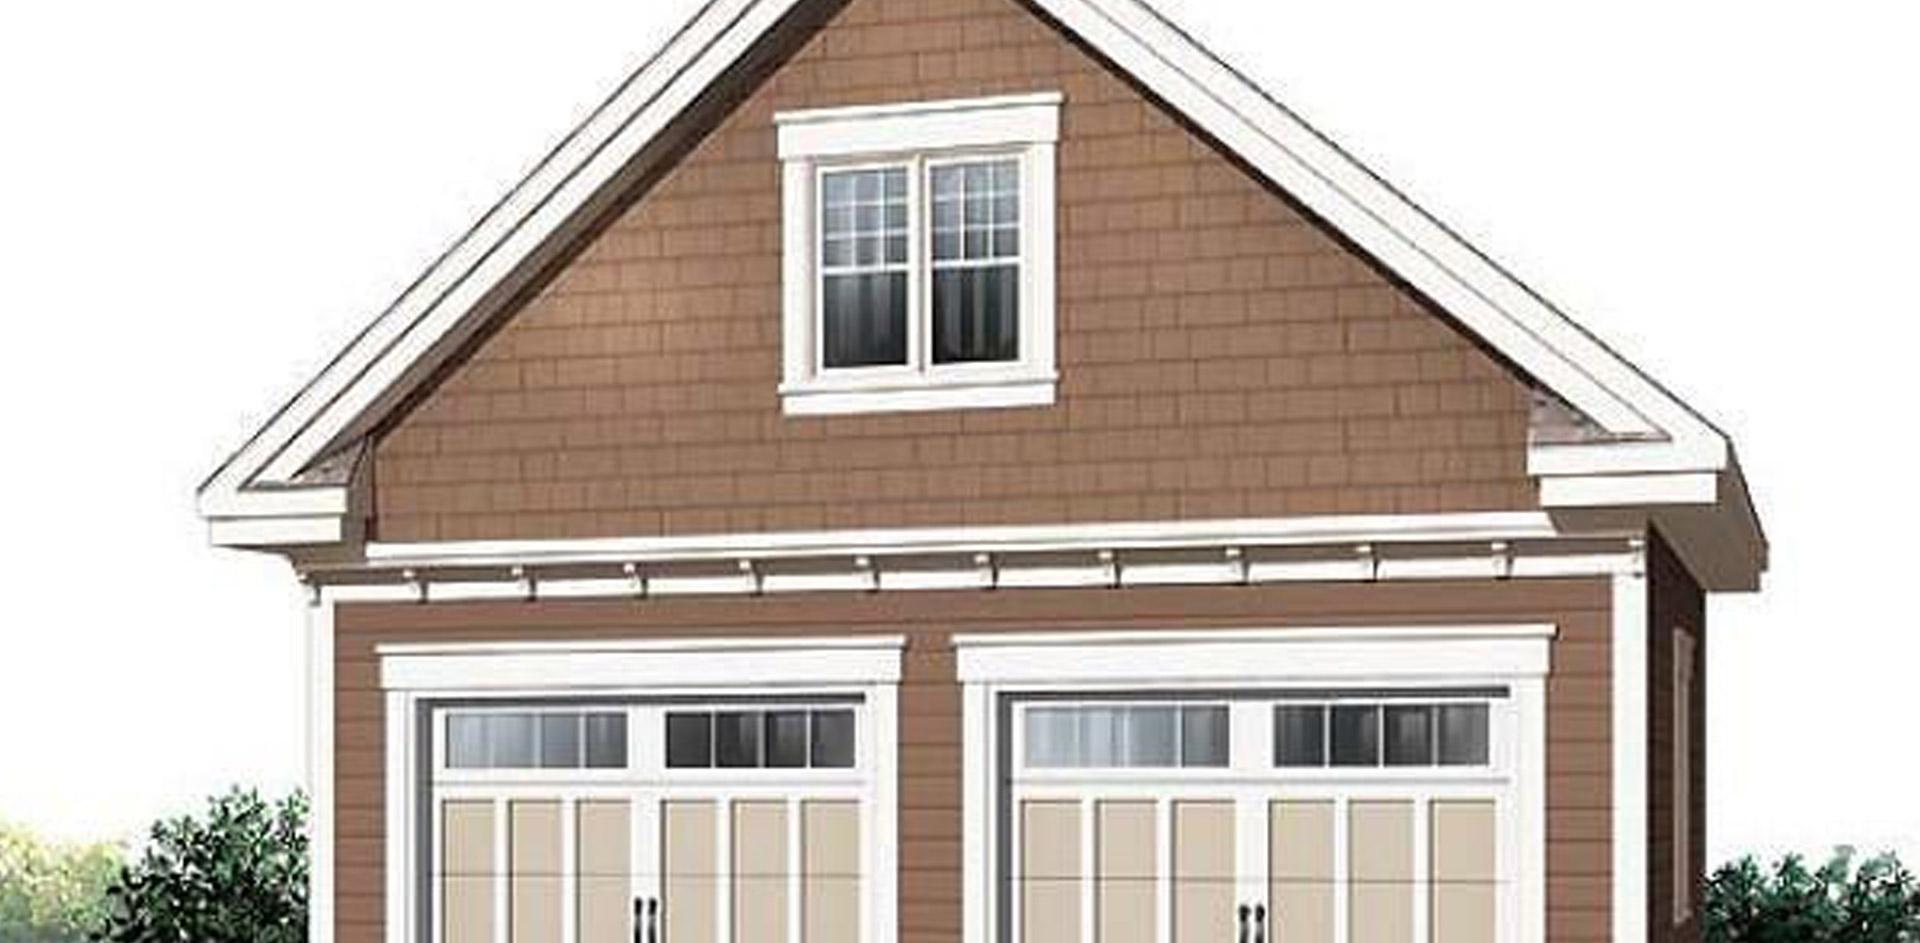 939 sq.ft. timber mart garage